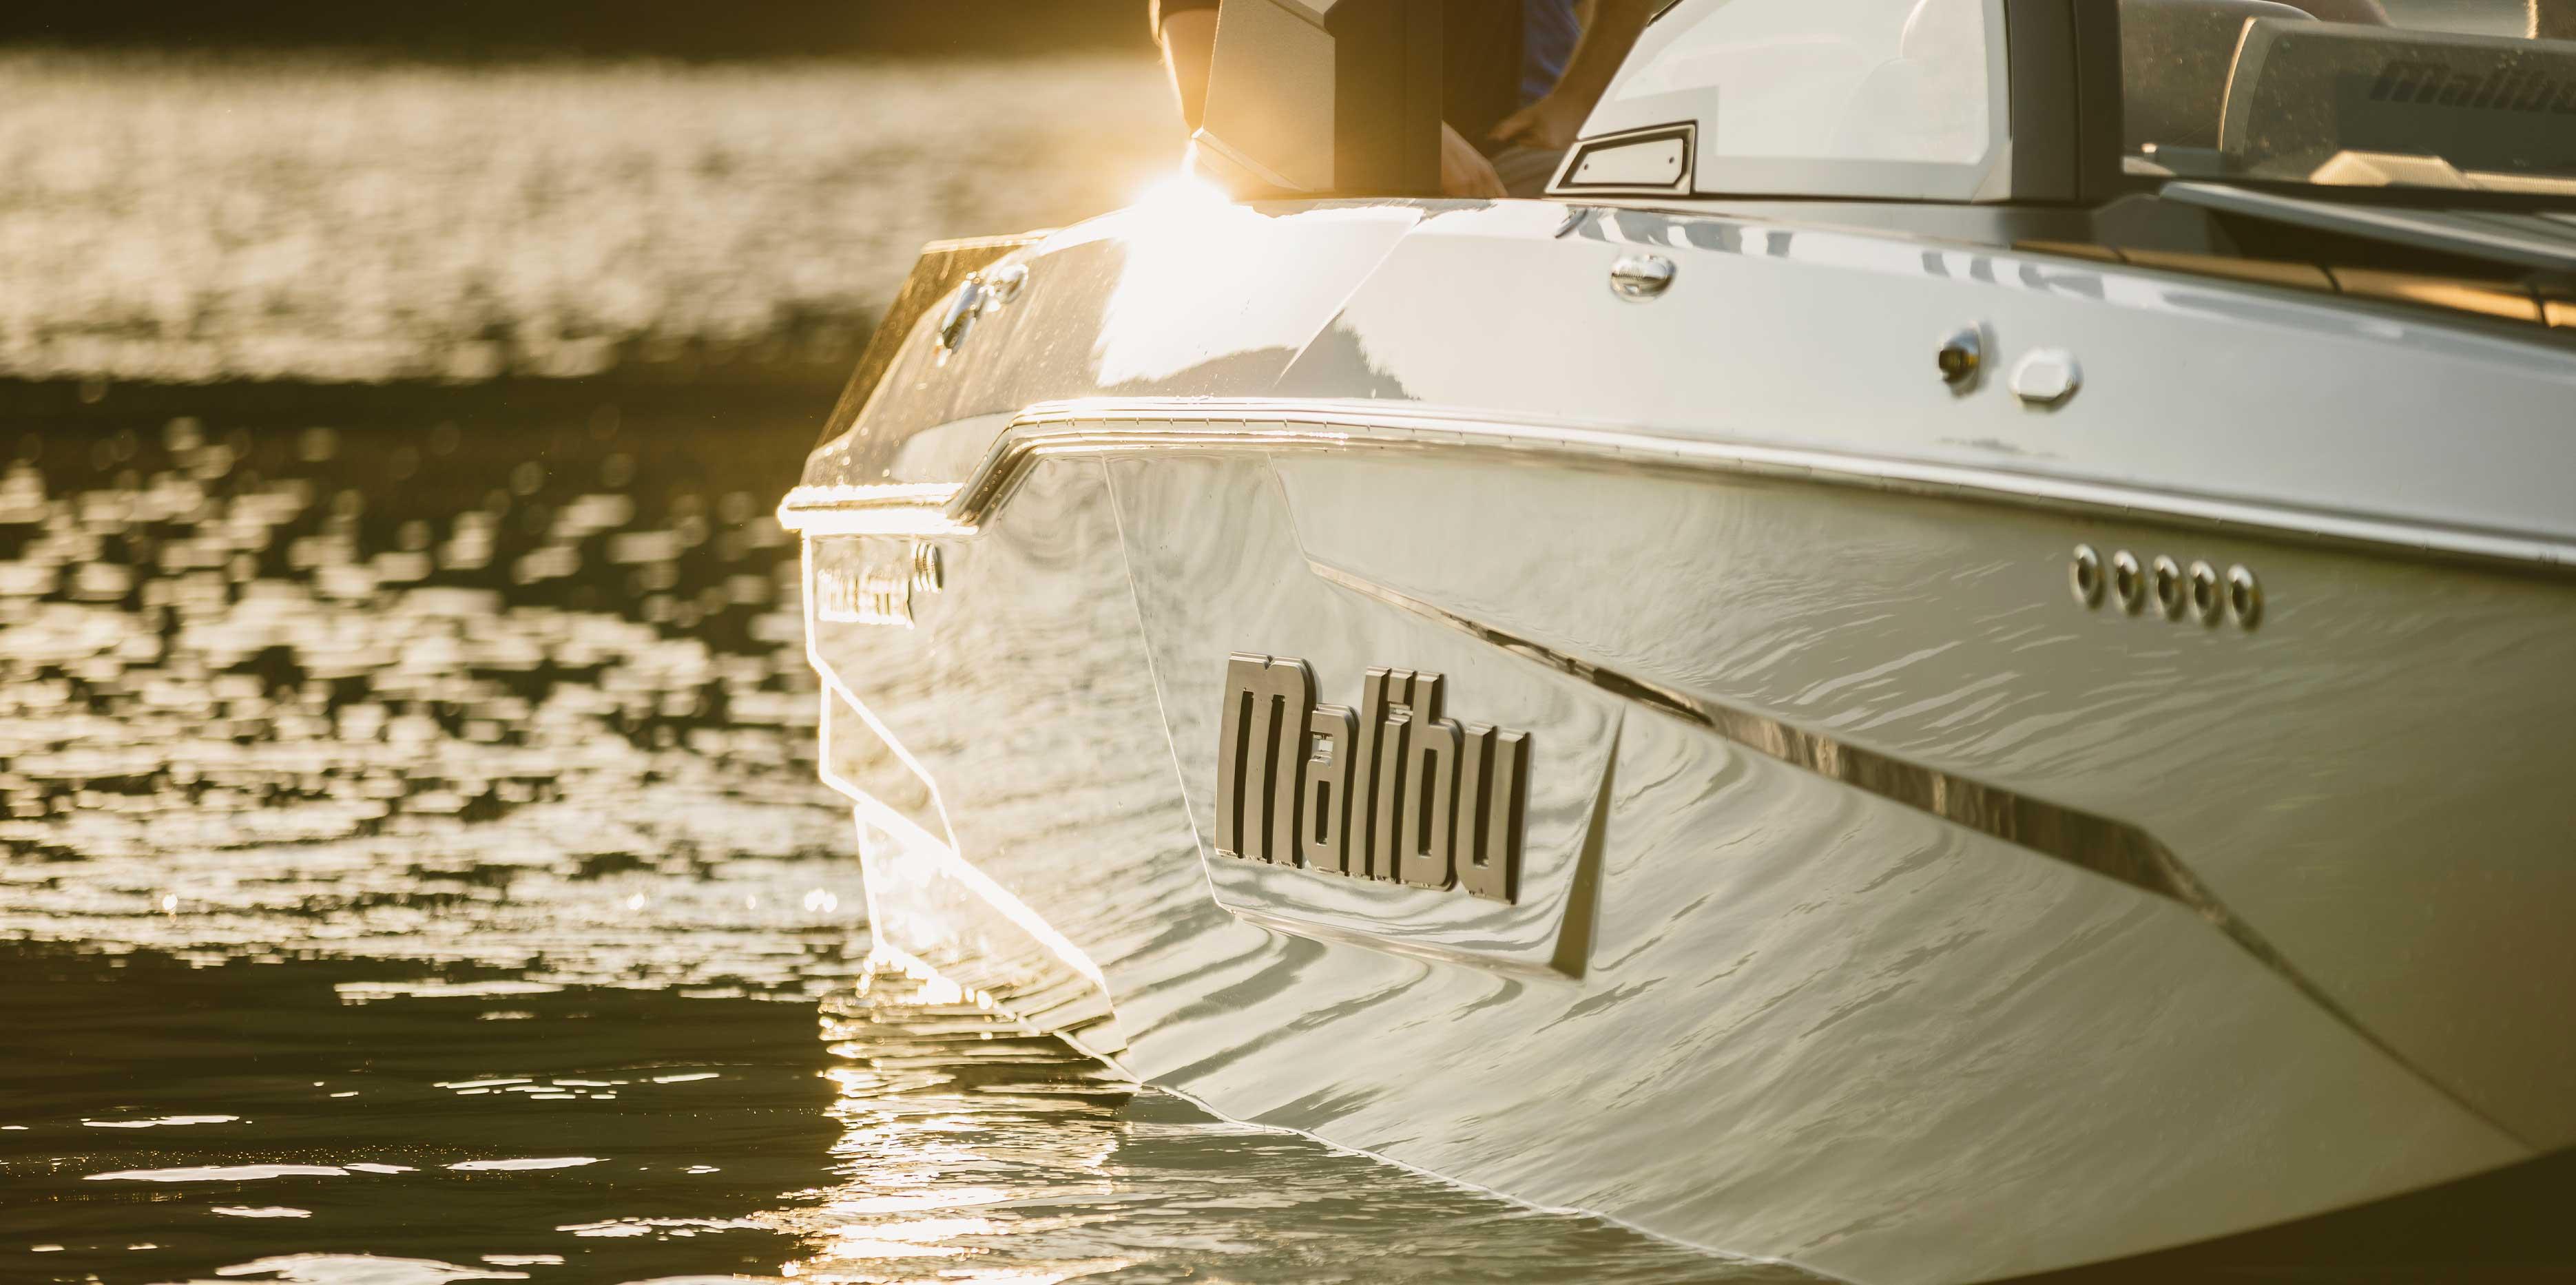 The Luxury Malibu Wakesetter 25 LSV